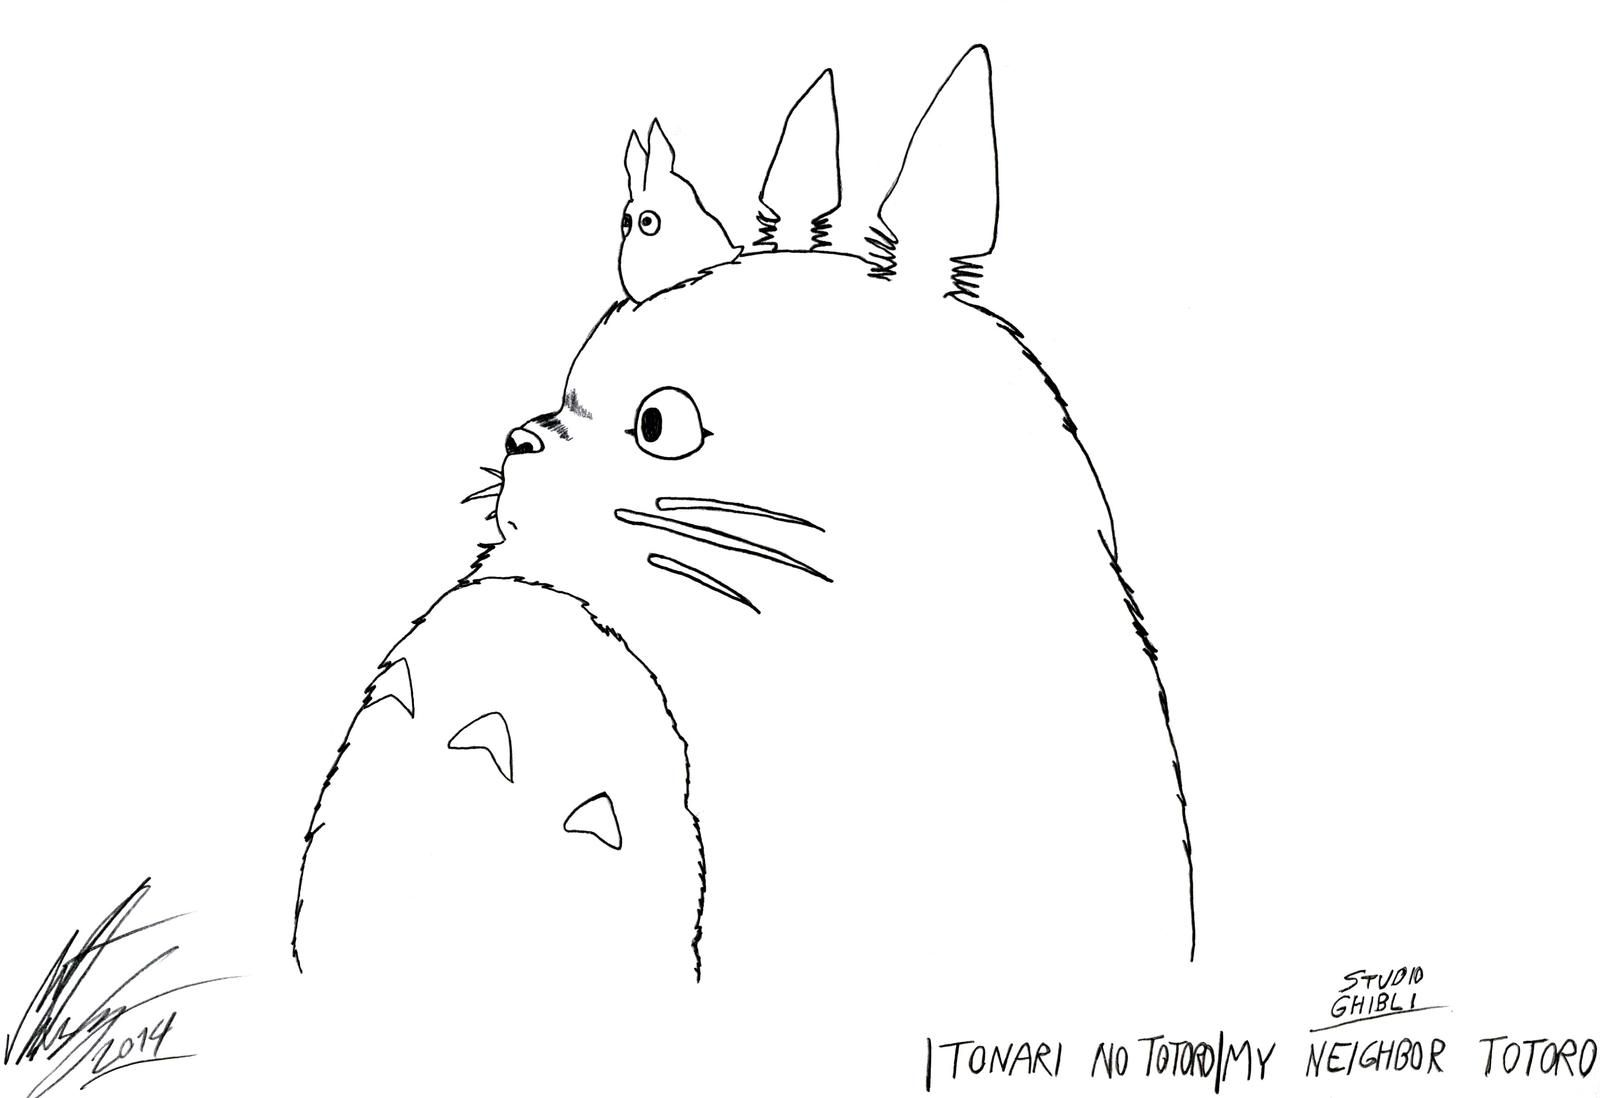 Studio Ghibli My Neighbor Totoro By Morteneng21 On Deviantart Totoro Drawing Totoro Art My Neighbor Totoro [ 1098 x 1600 Pixel ]